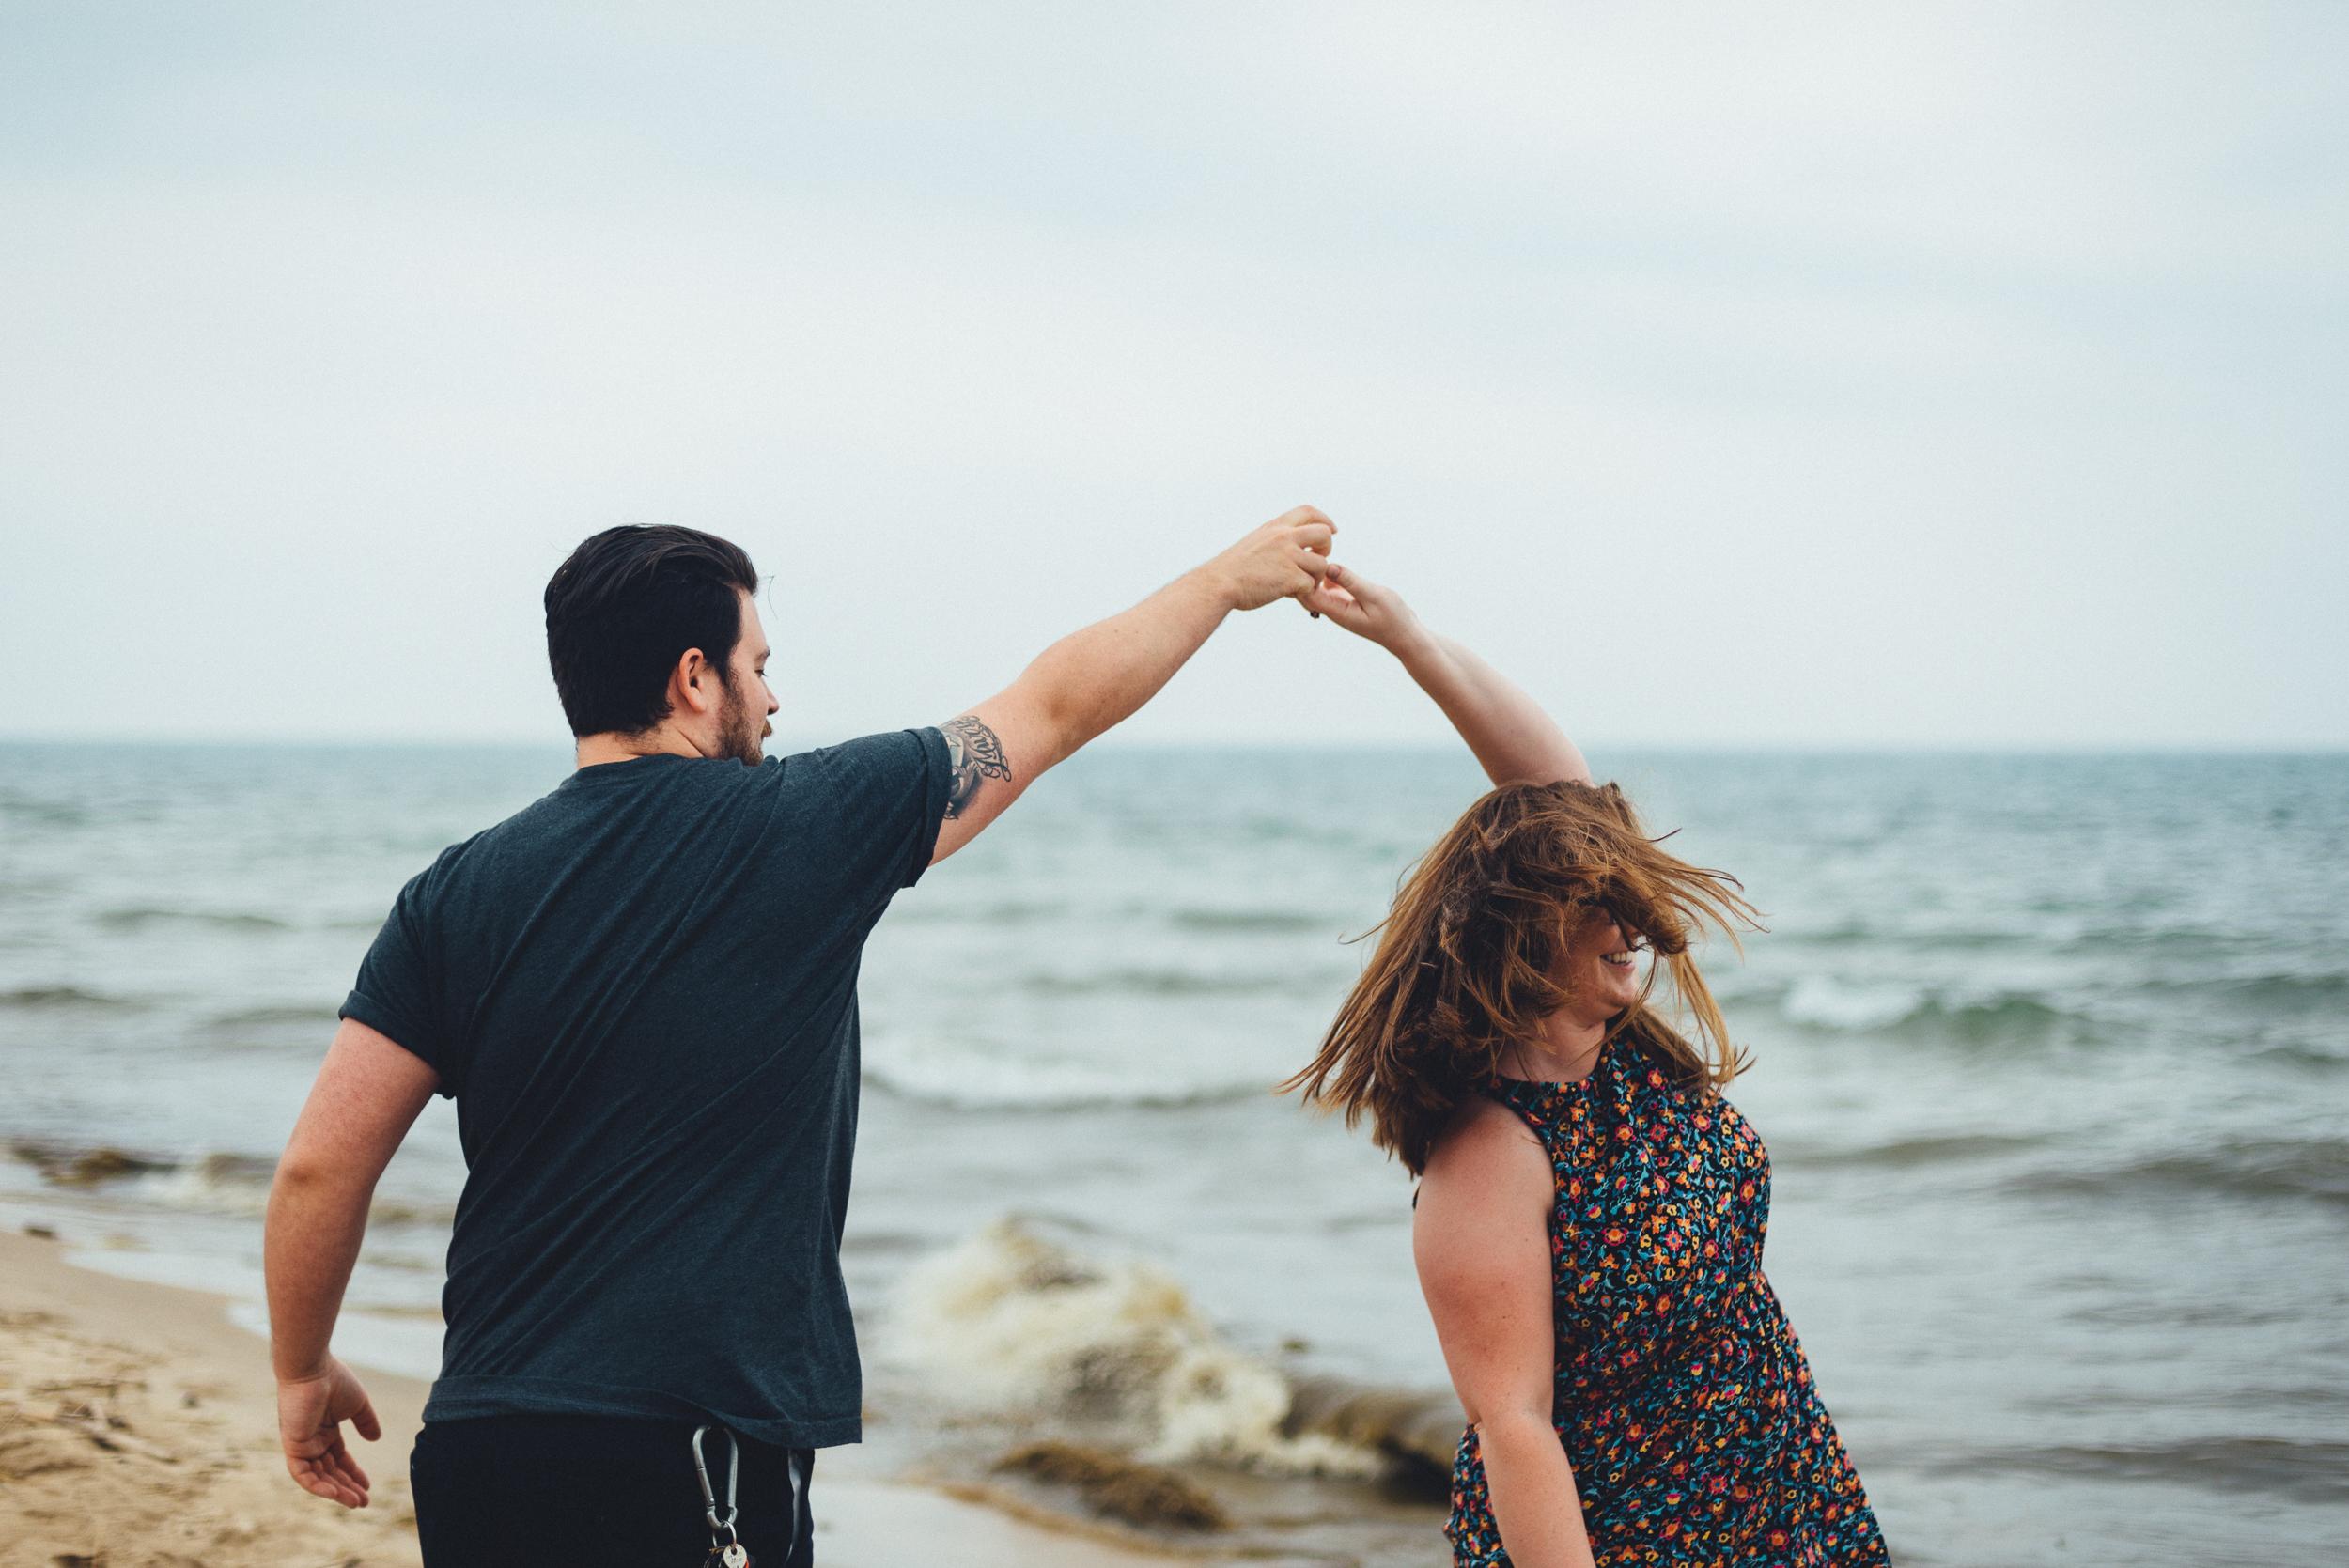 beach_couple_photography_engagment_love_long_island_photographer-11.jpg